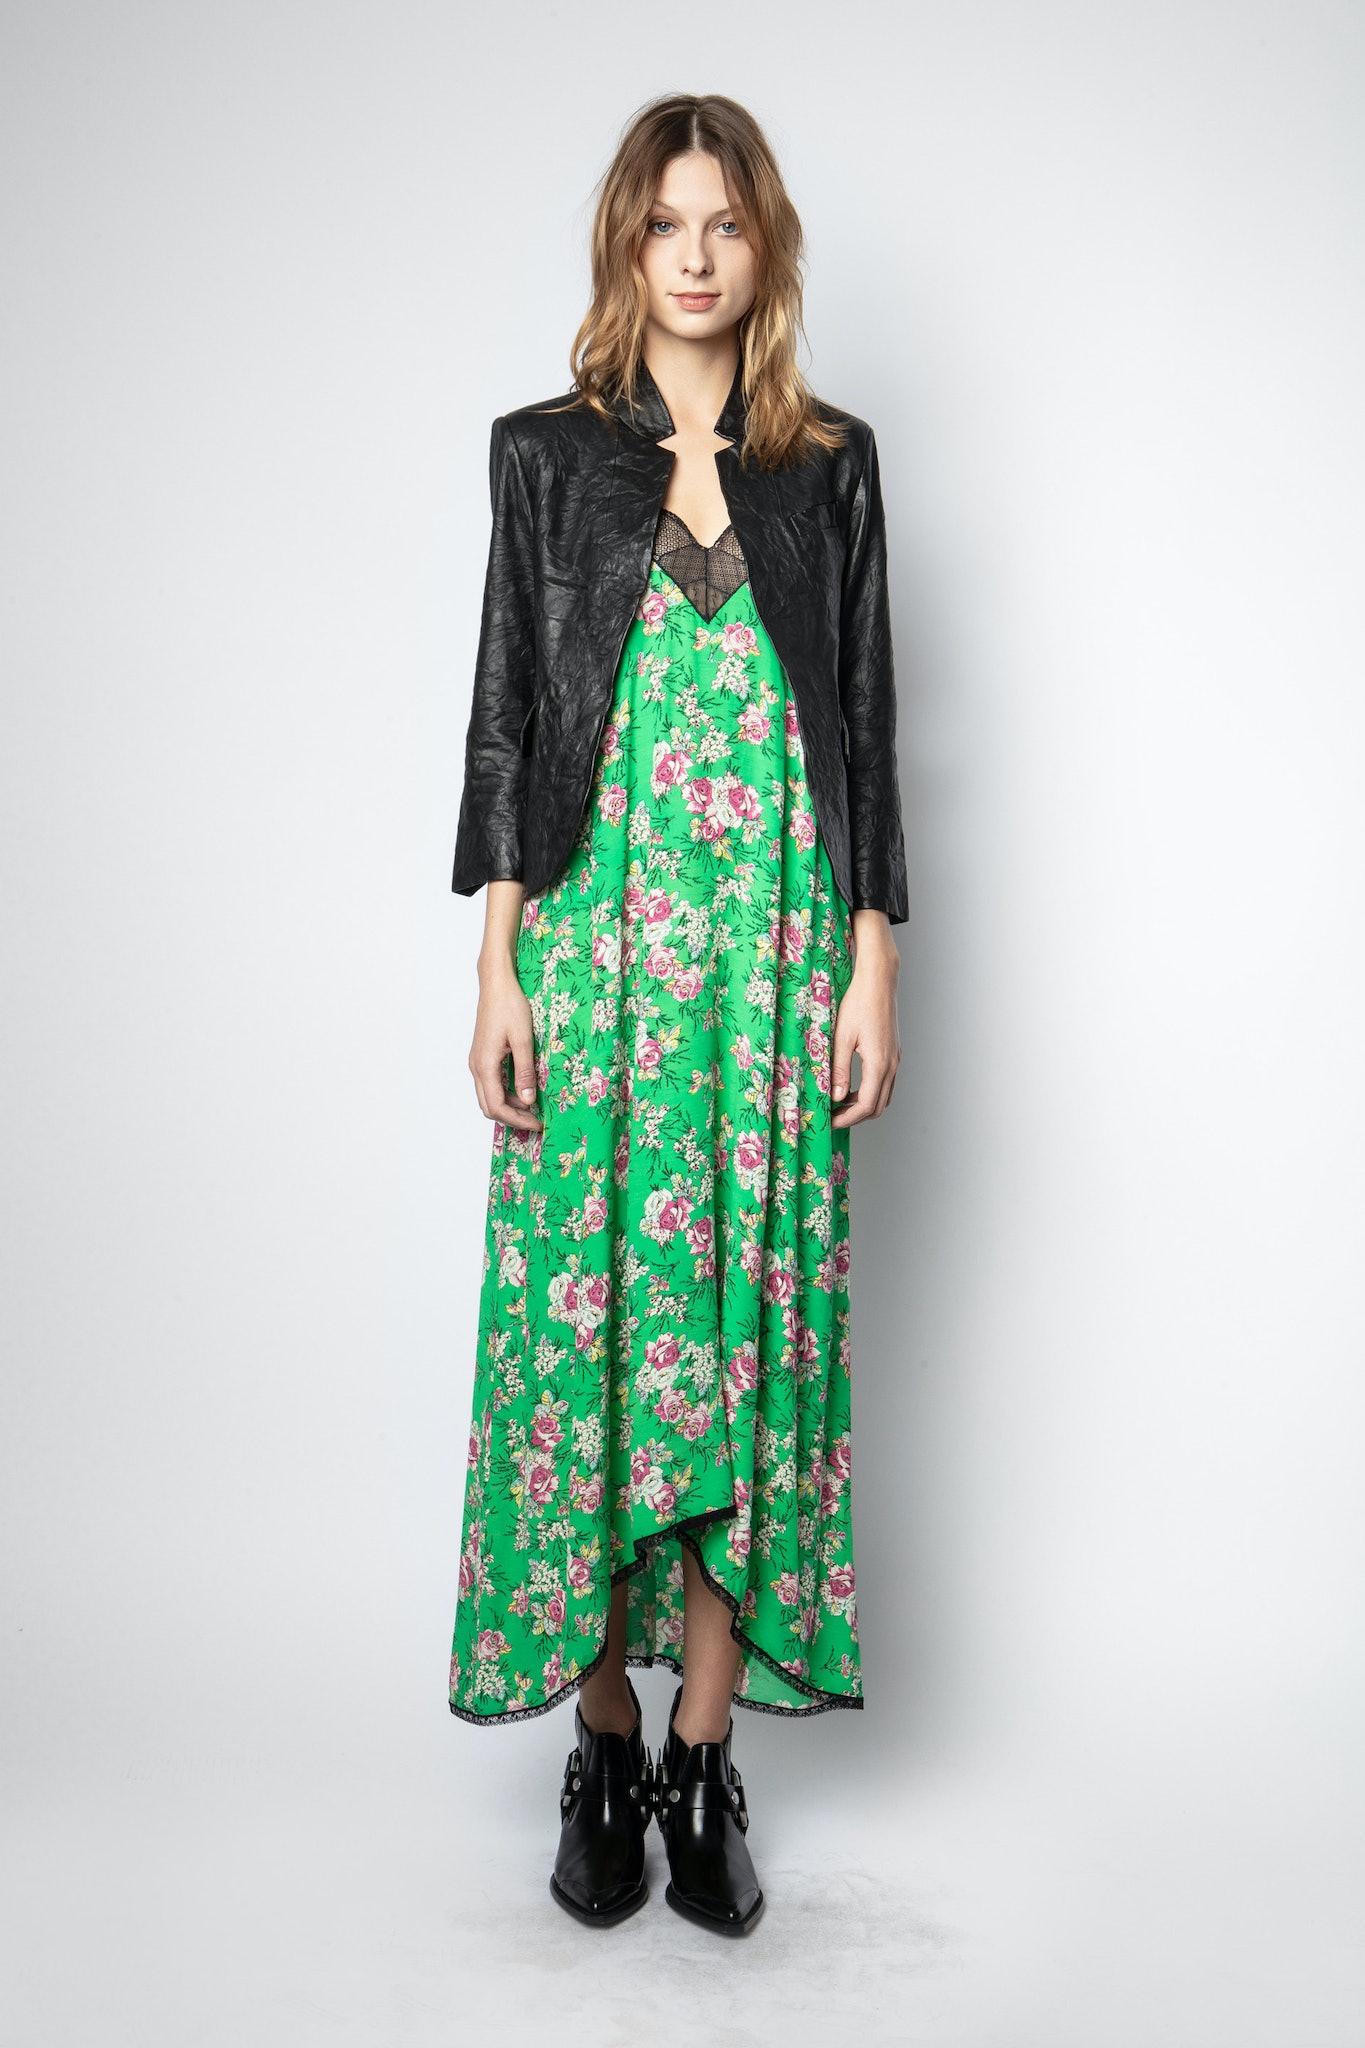 Risty Print Roses Dress